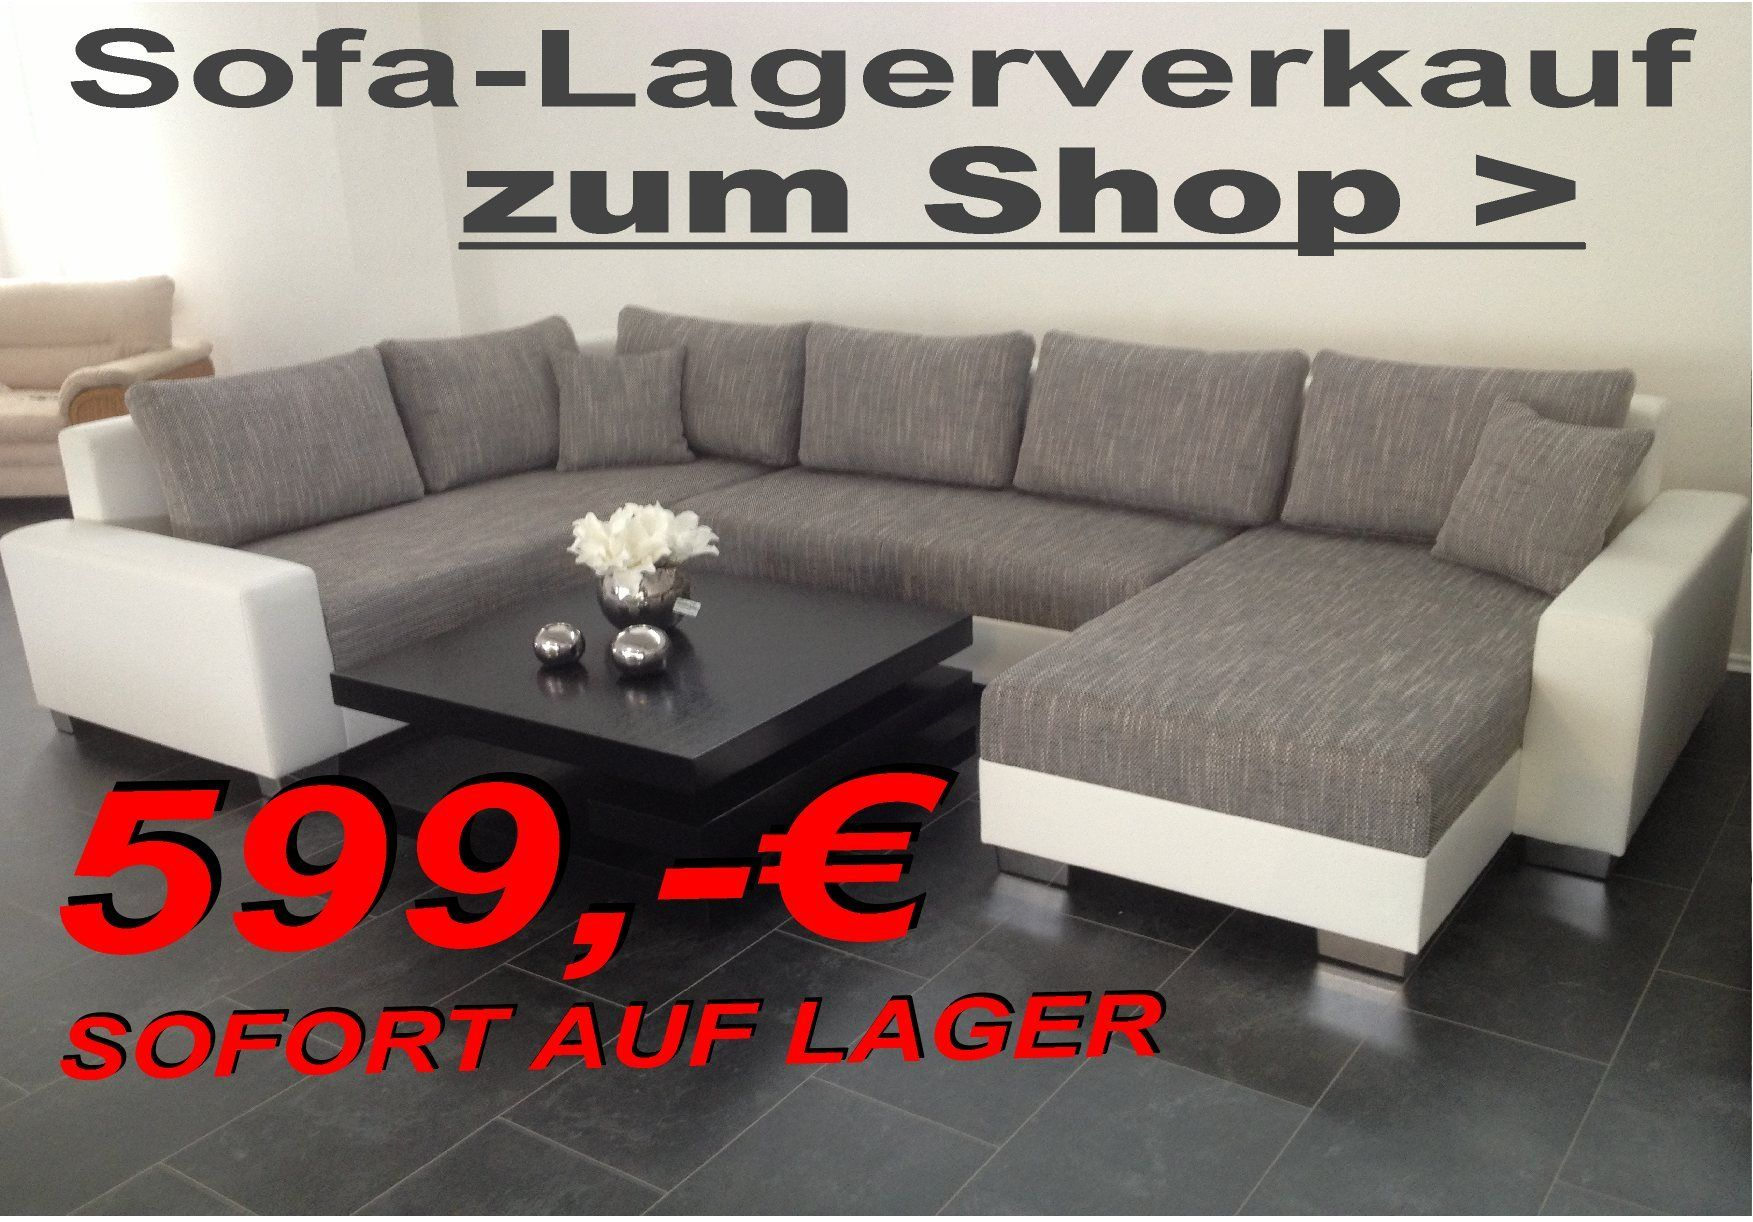 f596f6a96638b6 Möbel günstig kaufen  Sofa lagerverkauf